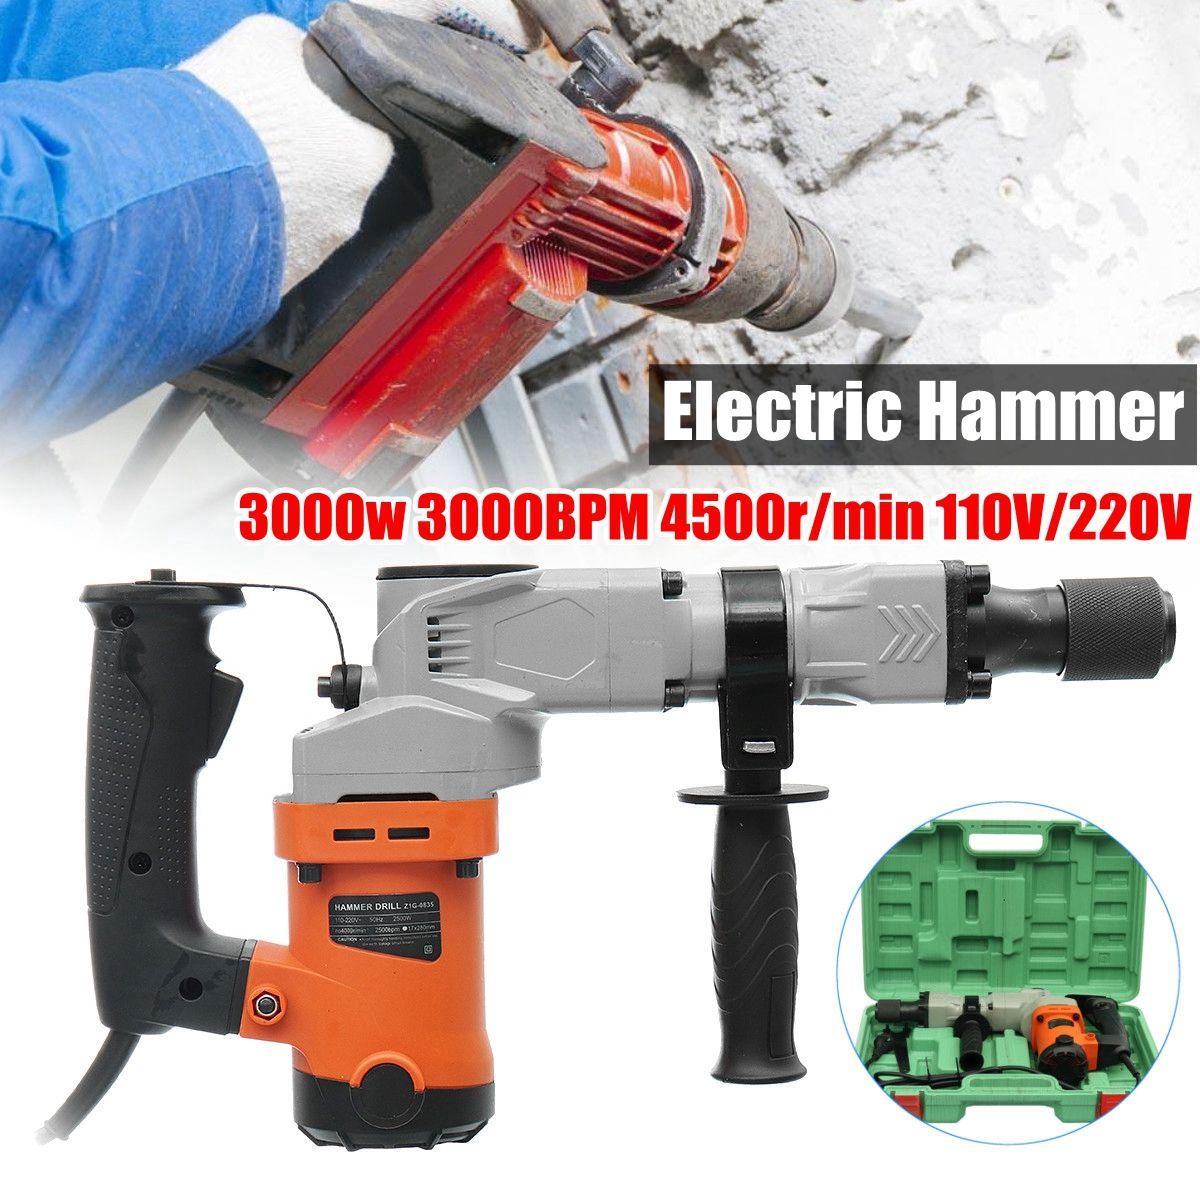 220V Electric Drills 3000W Electric Demolition Hammer Drill Concrete Breaker Punch Jackhammer 3000BPM